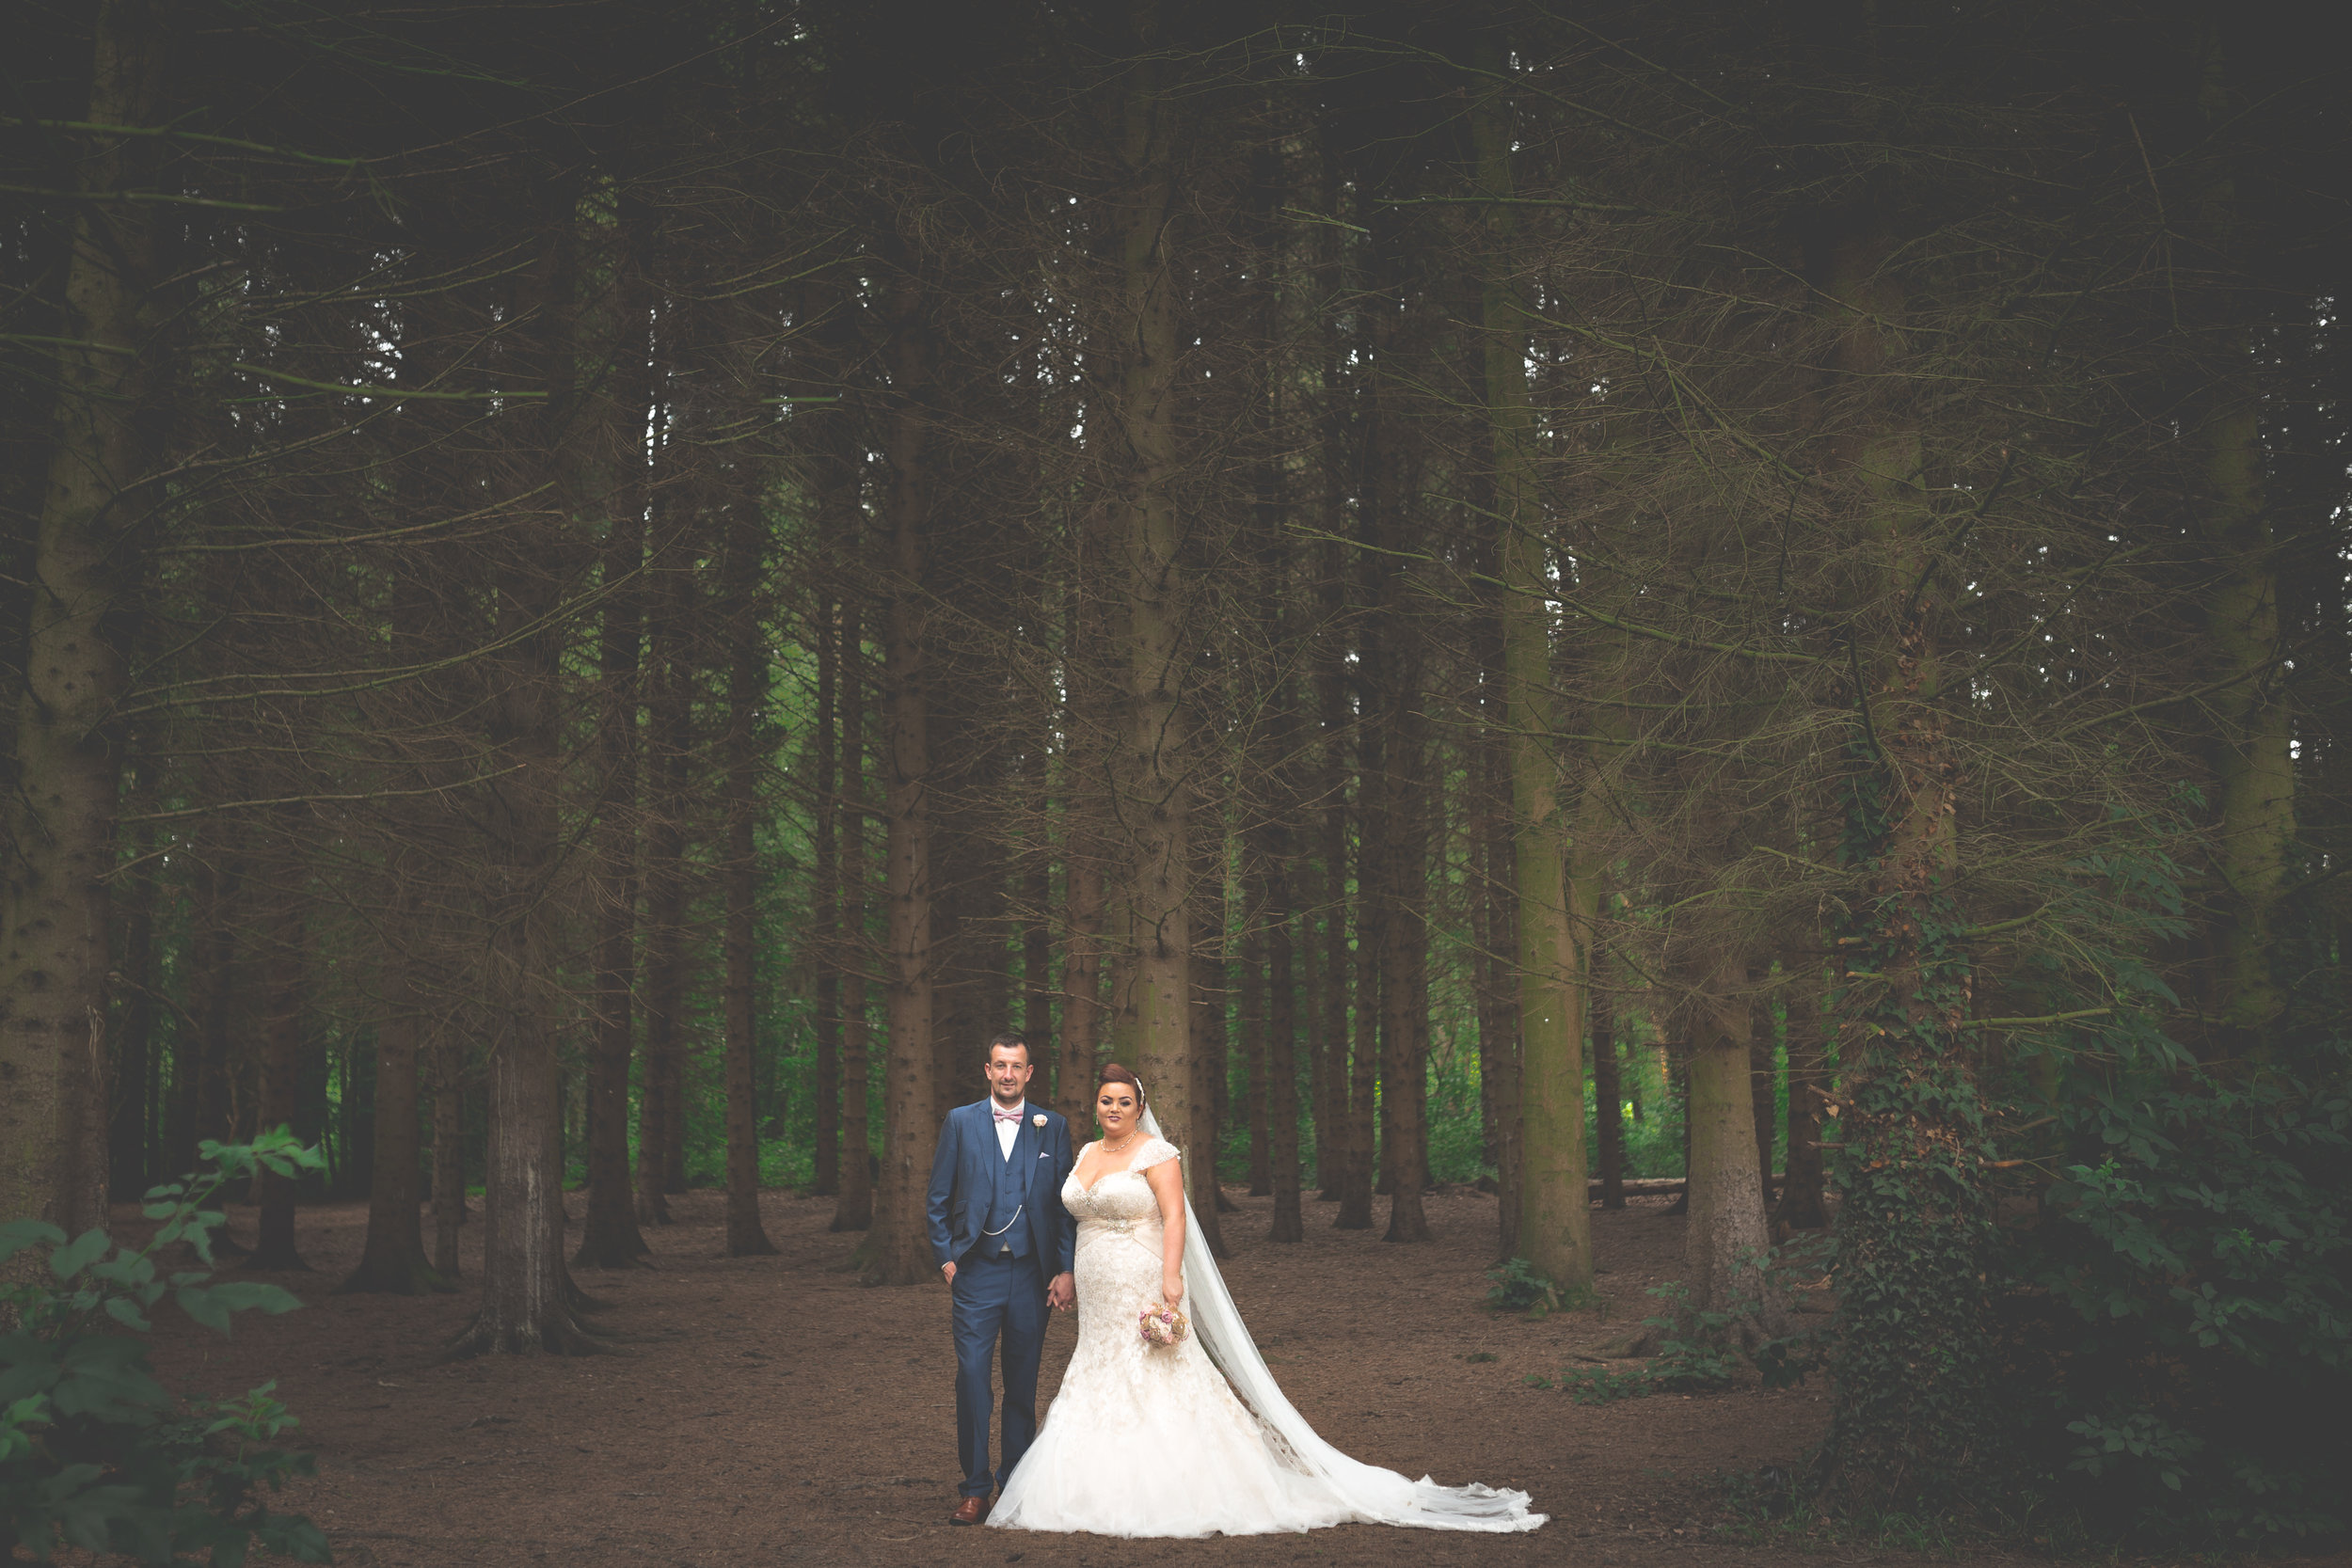 Antoinette & Stephen - Portraits   Brian McEwan Photography   Wedding Photographer Northern Ireland 17.jpg